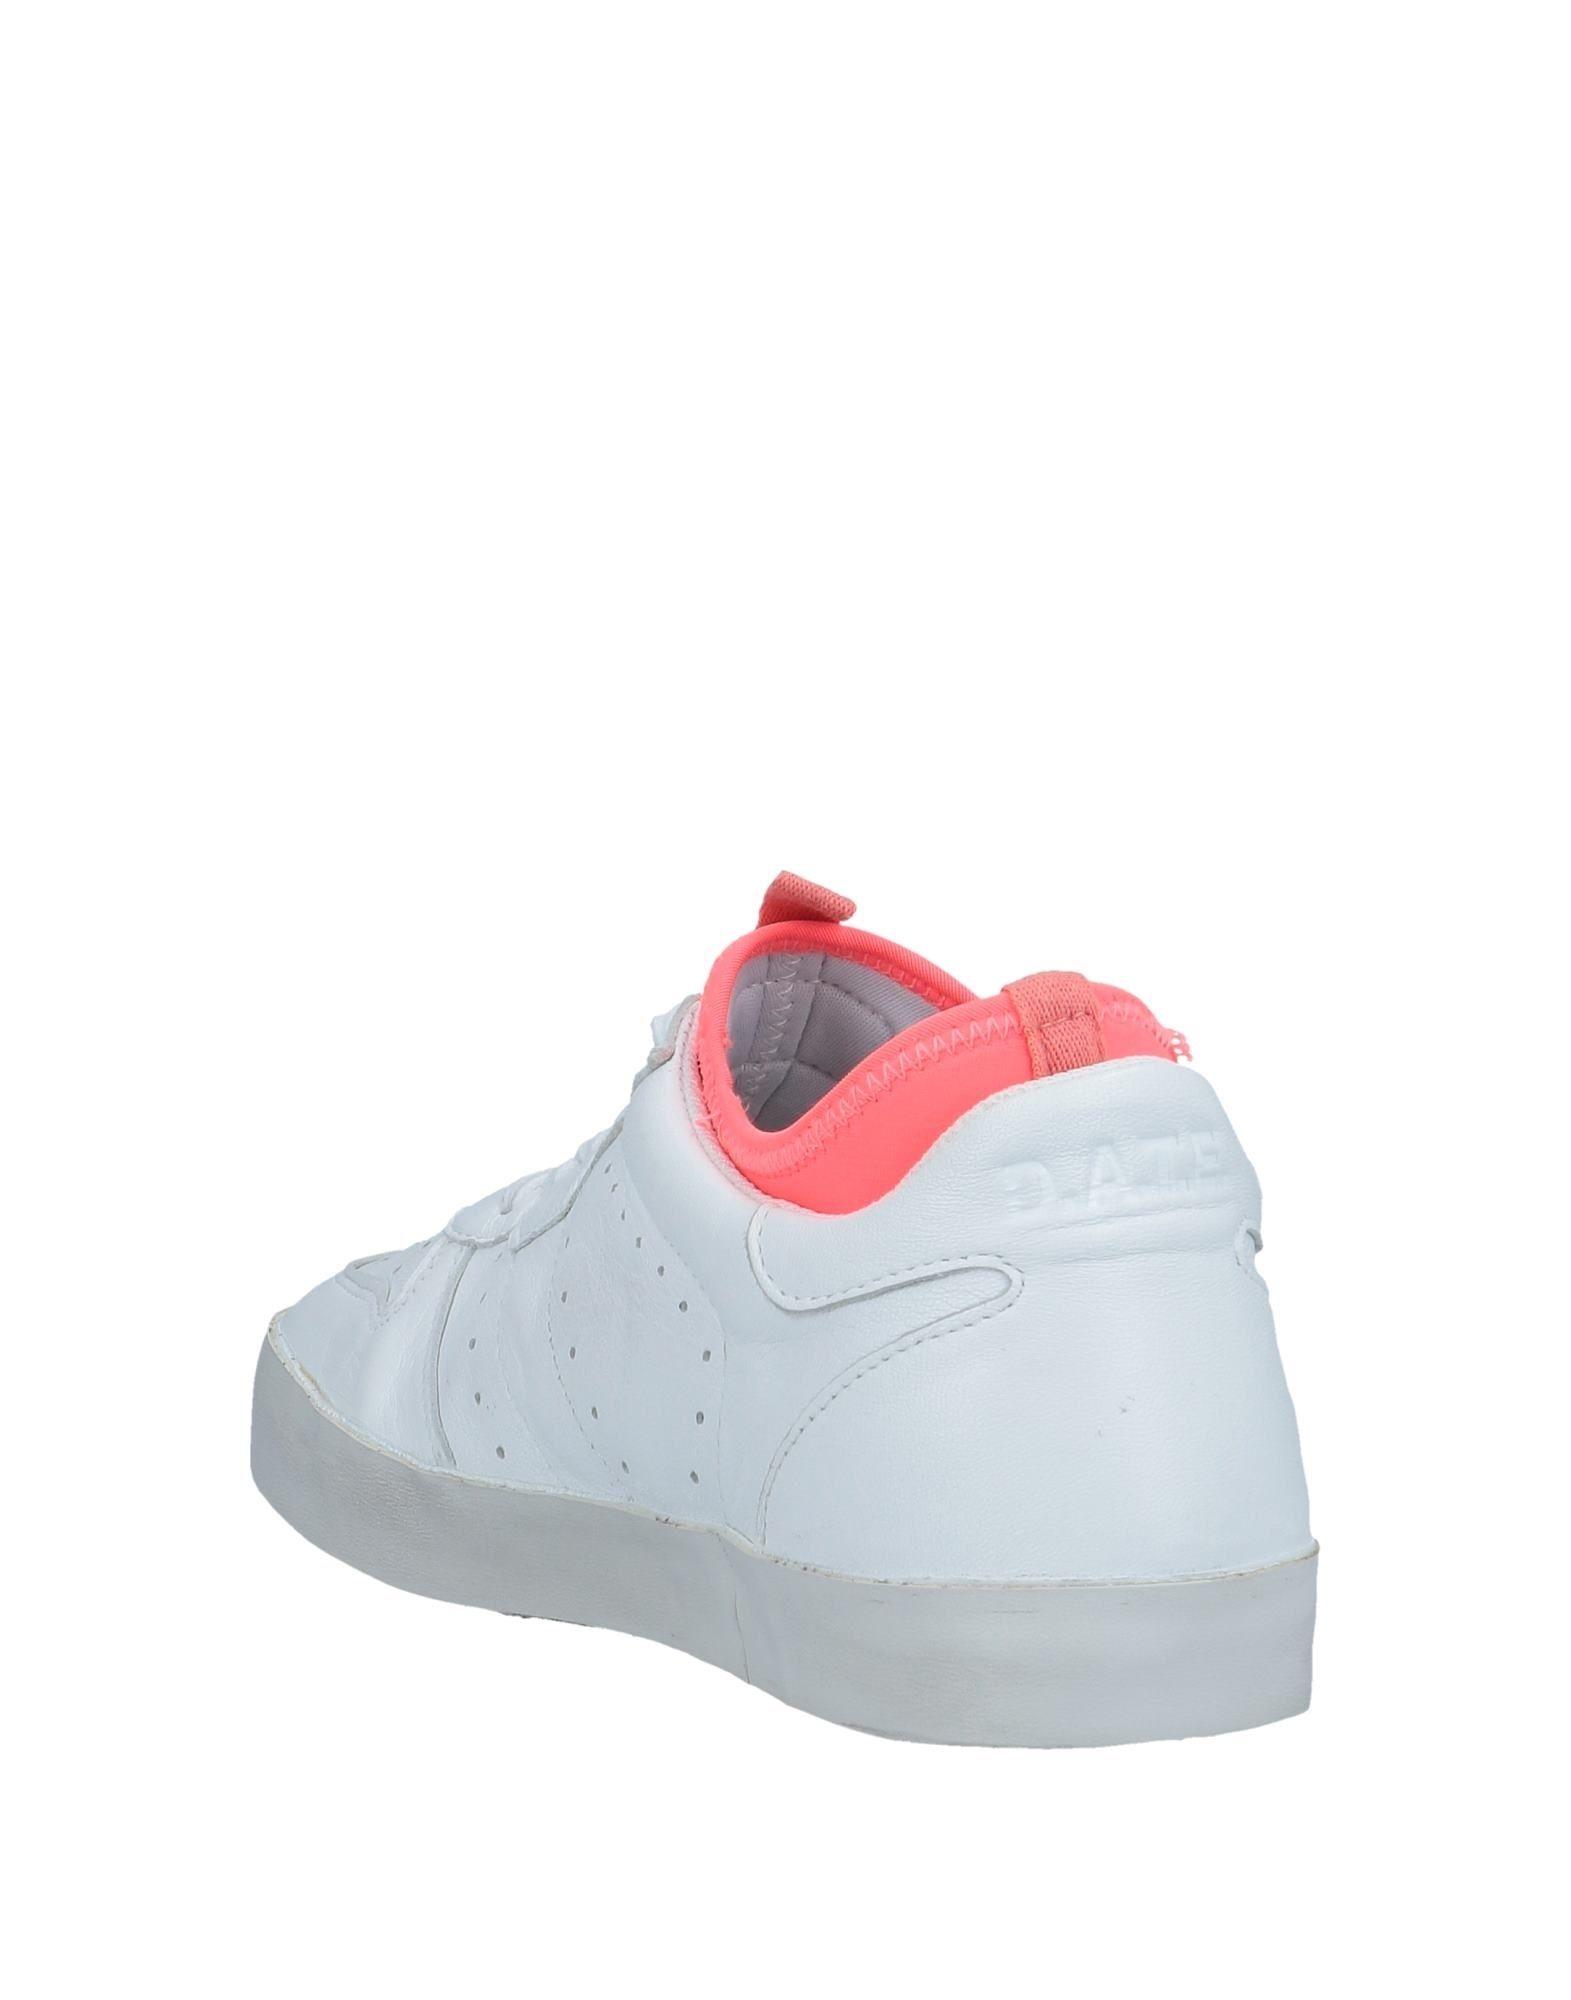 Gut tragenD.A.T.E. um billige Schuhe zu tragenD.A.T.E. Gut Sneakers Damen  11554505CP 8a89bd